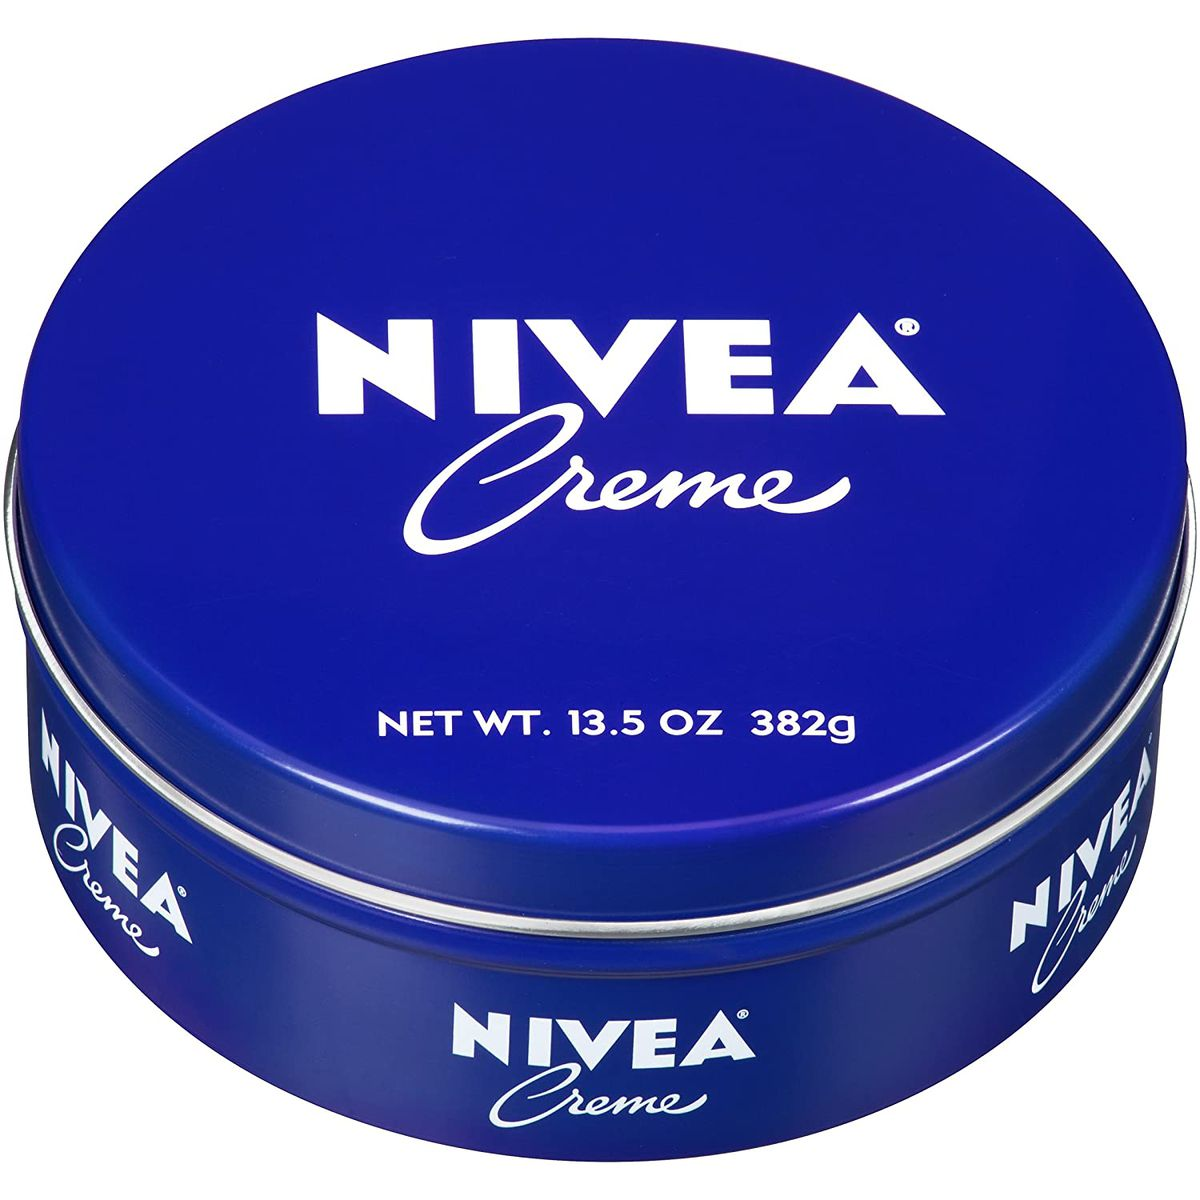 A jar of Nivea cream